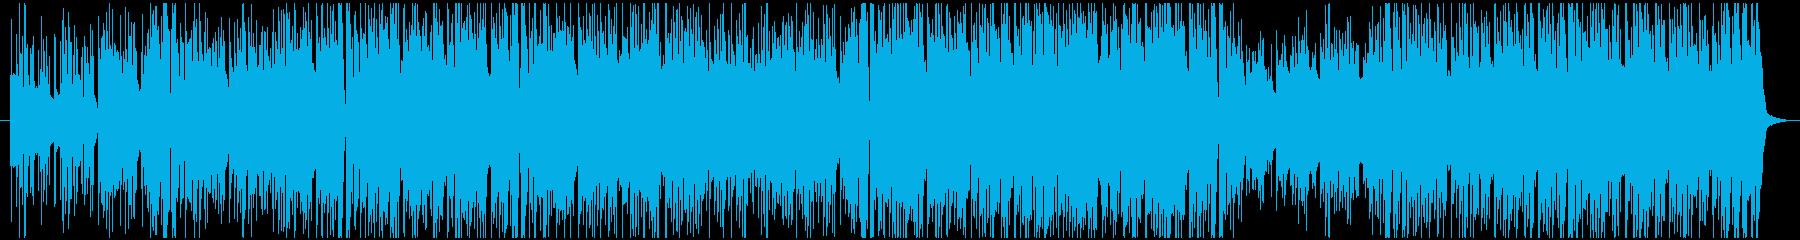 Ladies Adventures's reproduced waveform